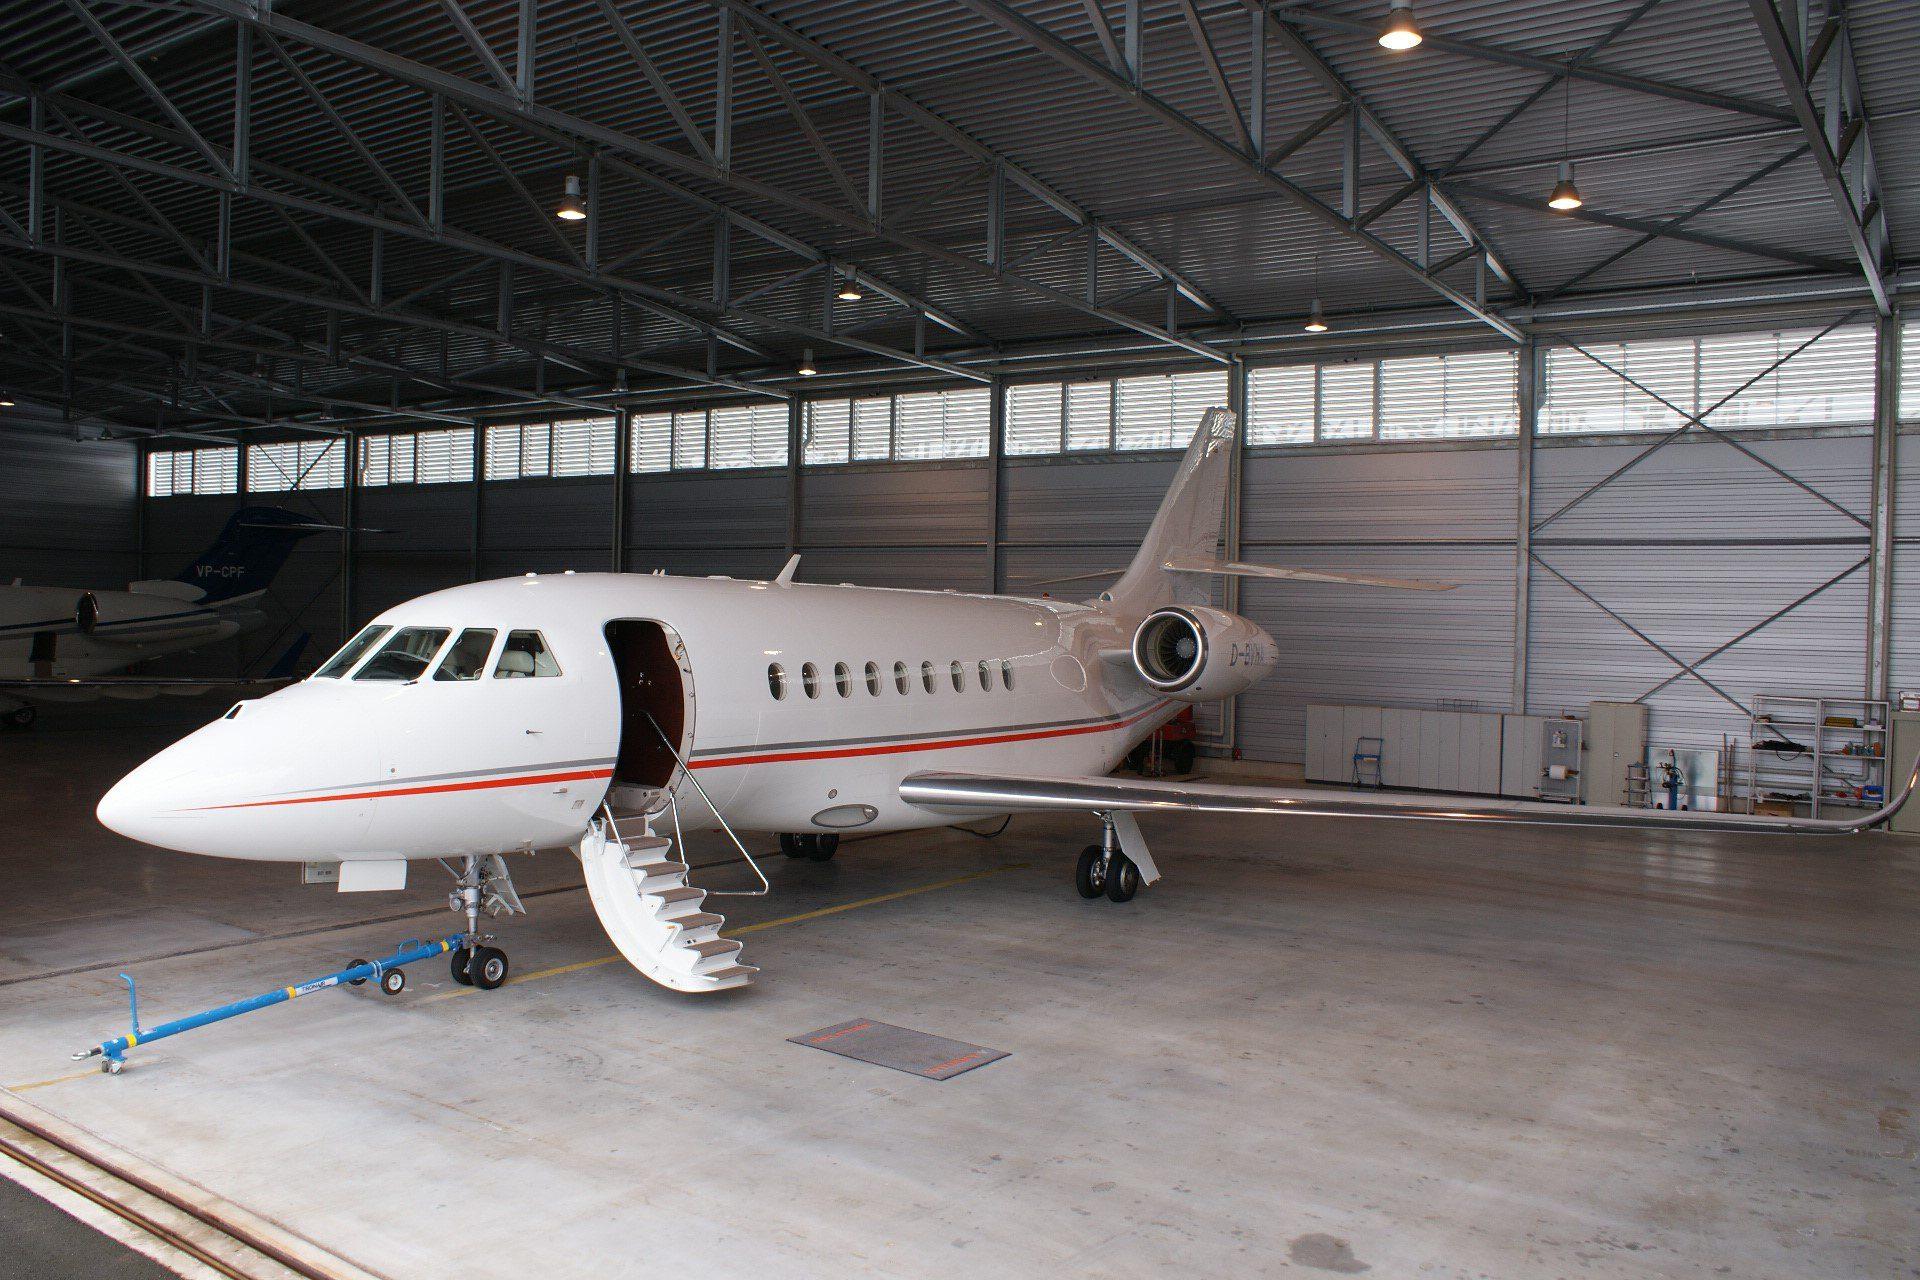 USAircraftSale-2013-Dassault-Falcon-2000LXS-4-263-03172017